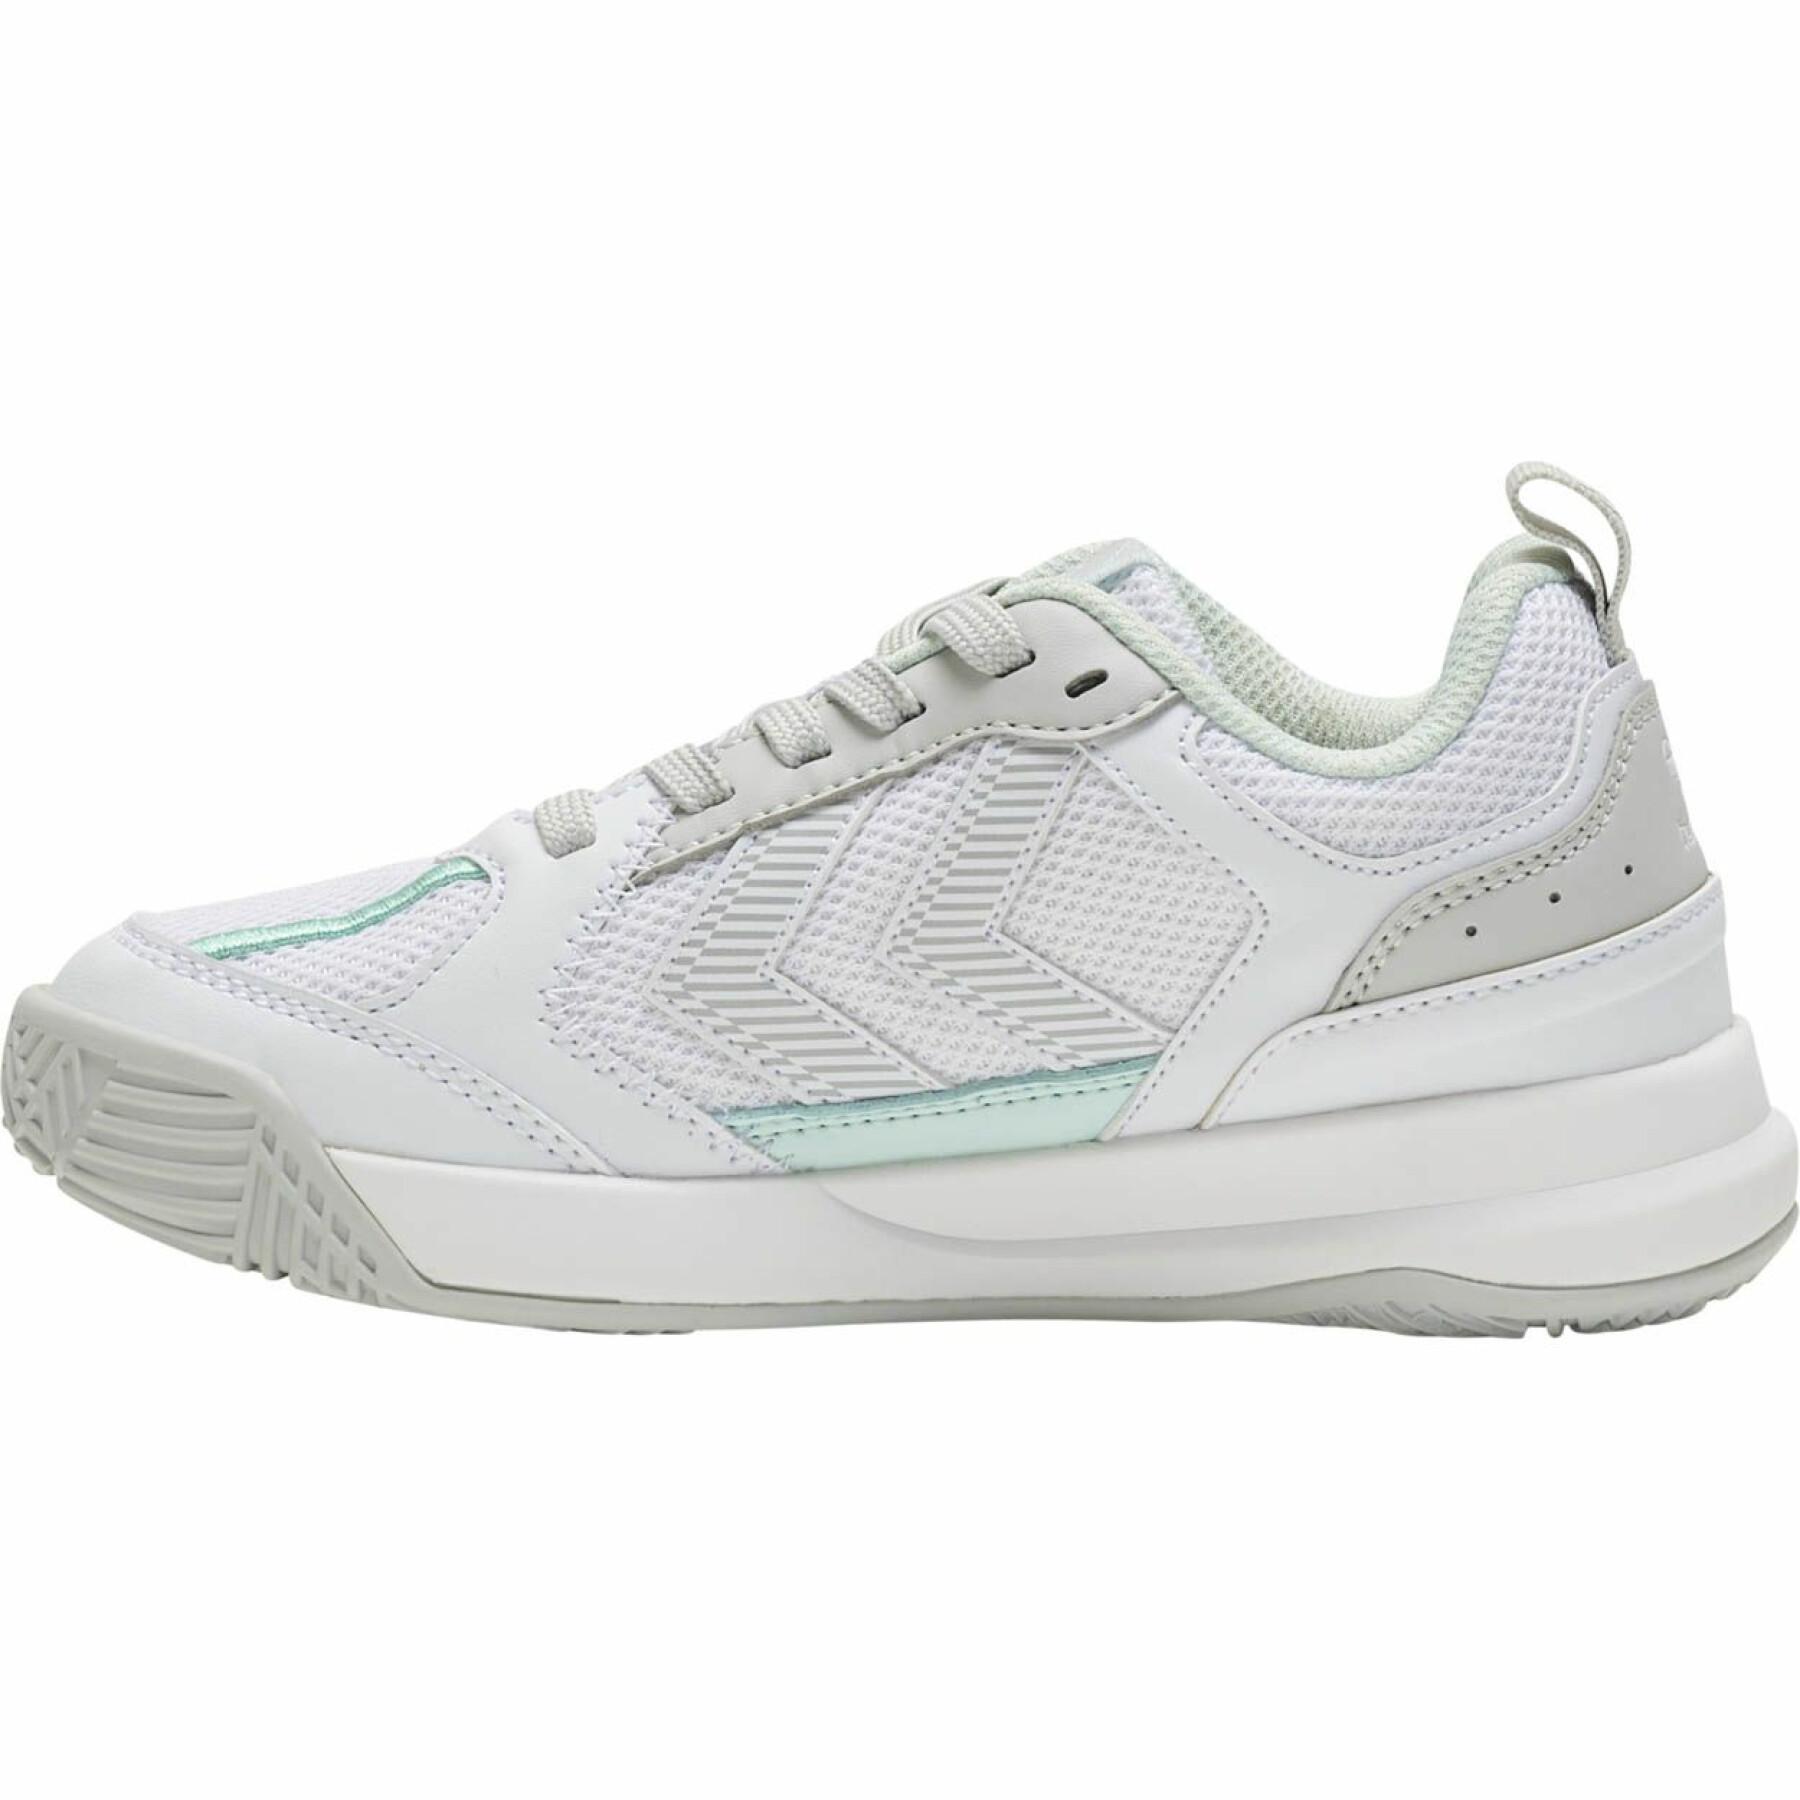 Children's shoes Hummel Dagaz